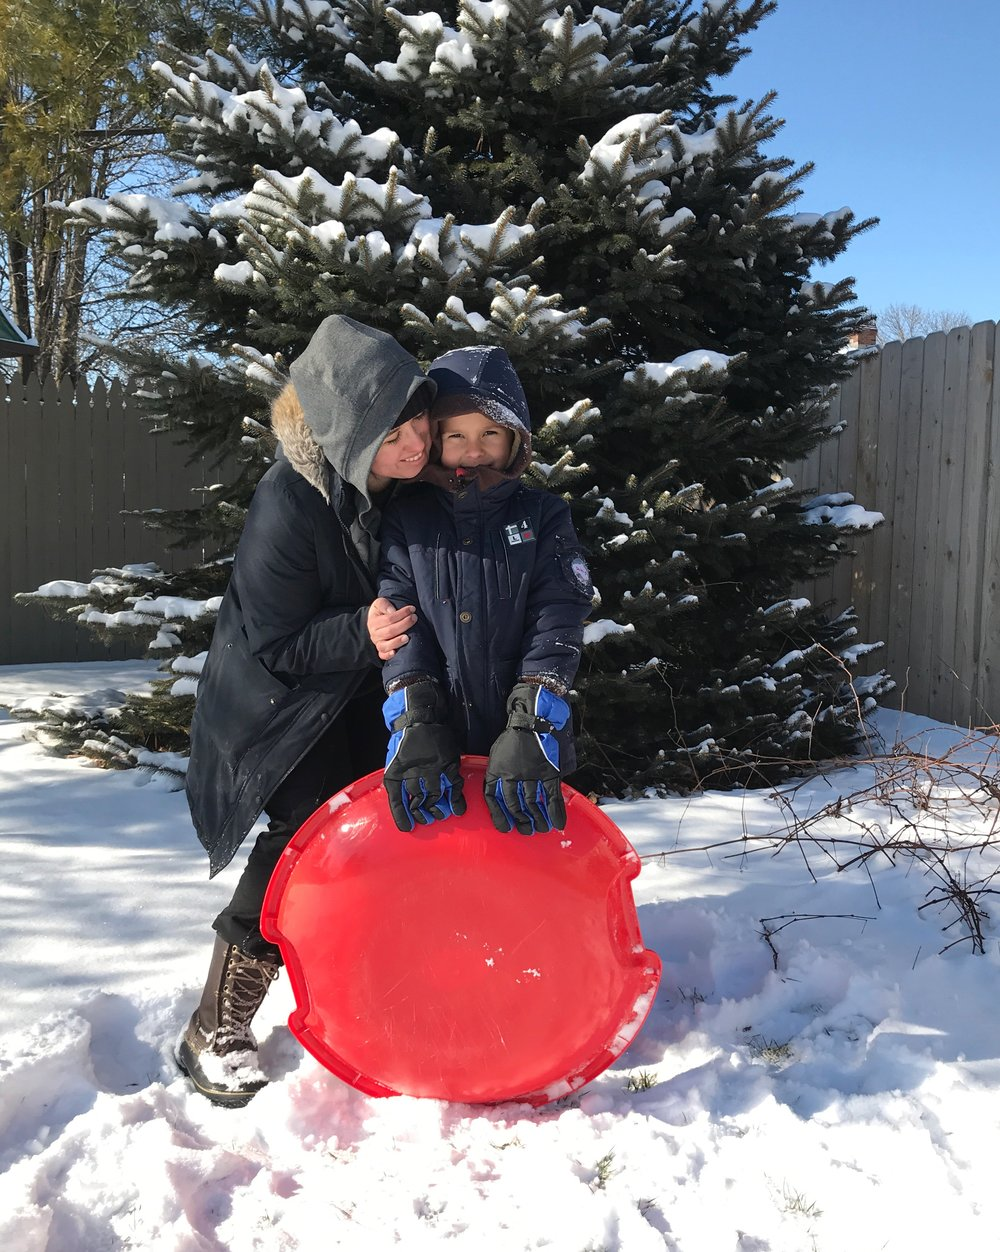 Snow Day | TetherAndFly.com